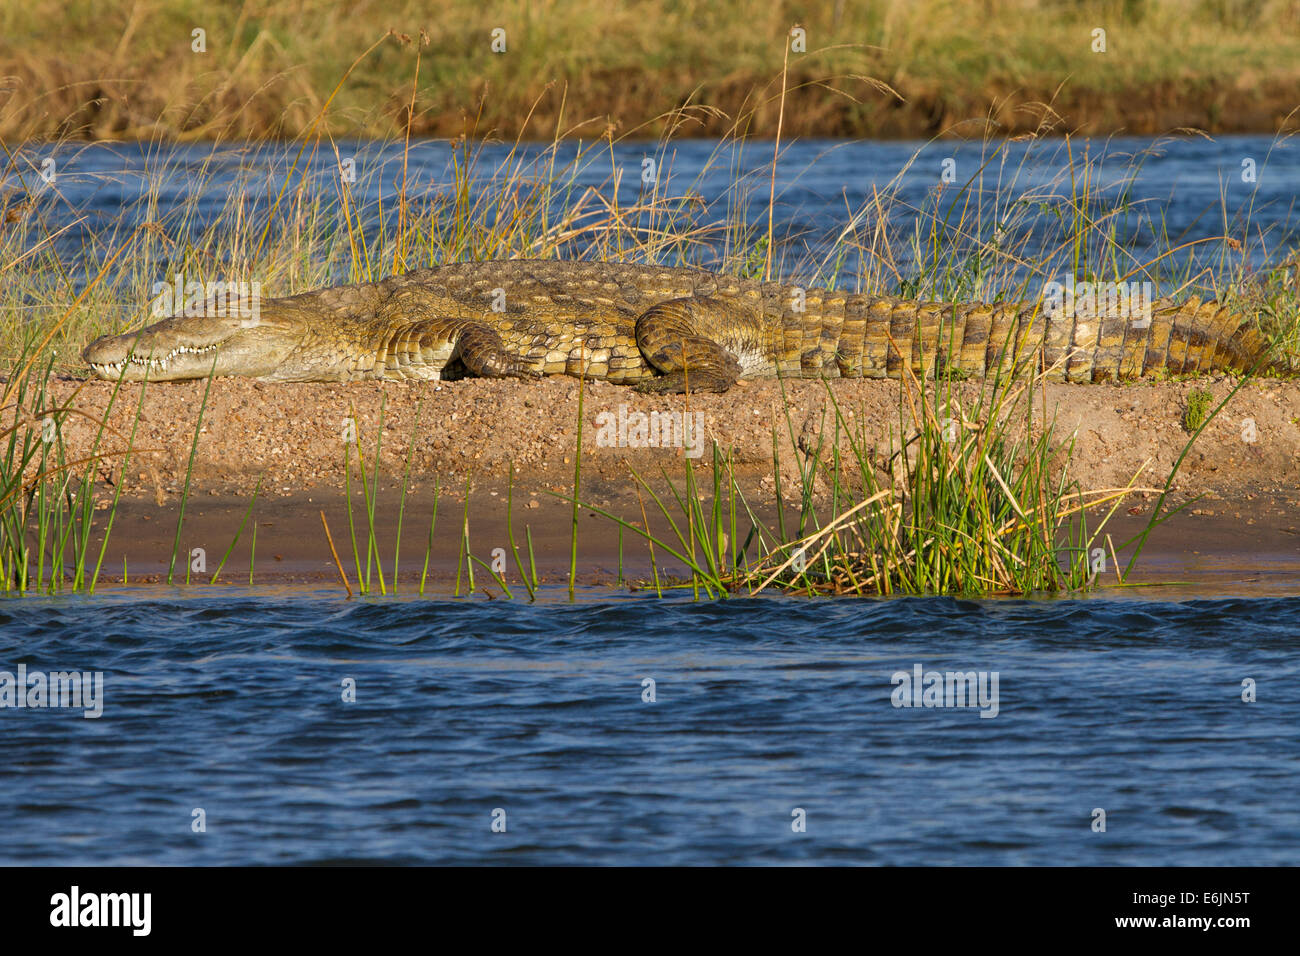 Crocodile basking in the sun - Stock Image